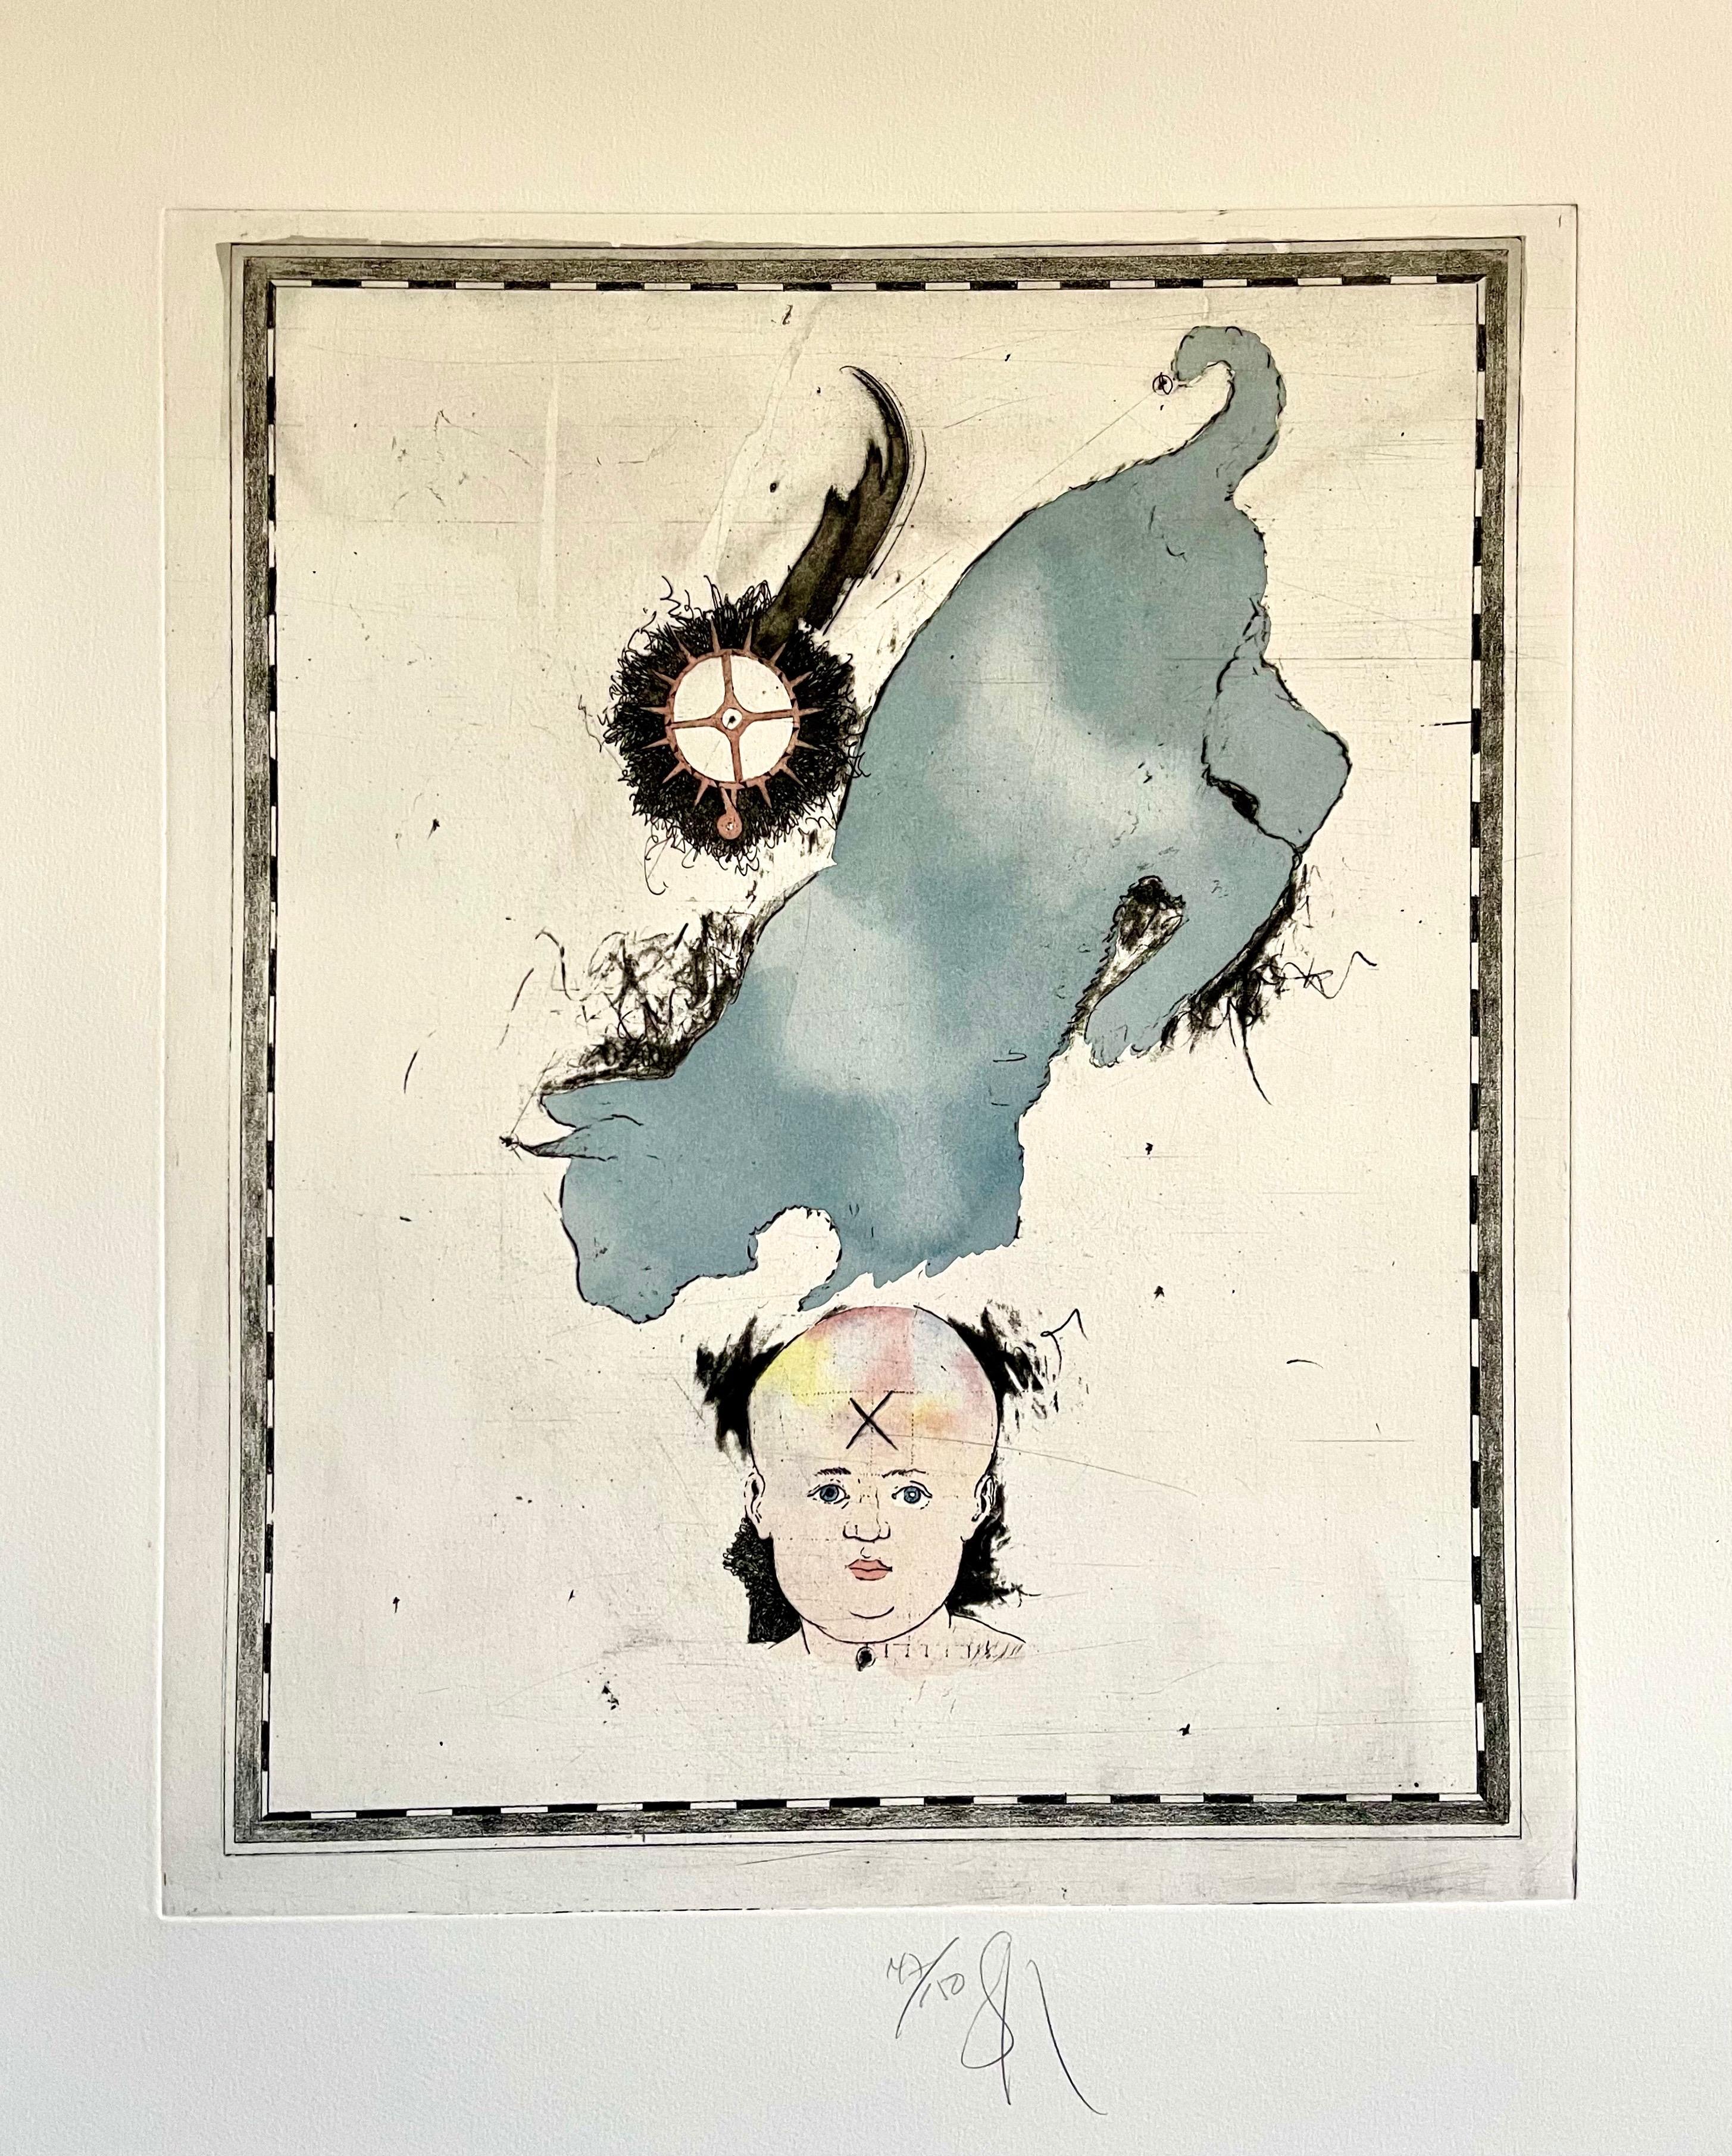 Large Donald Saff Surrealist Pop Art Aquatint Etching Blue cat with Baby